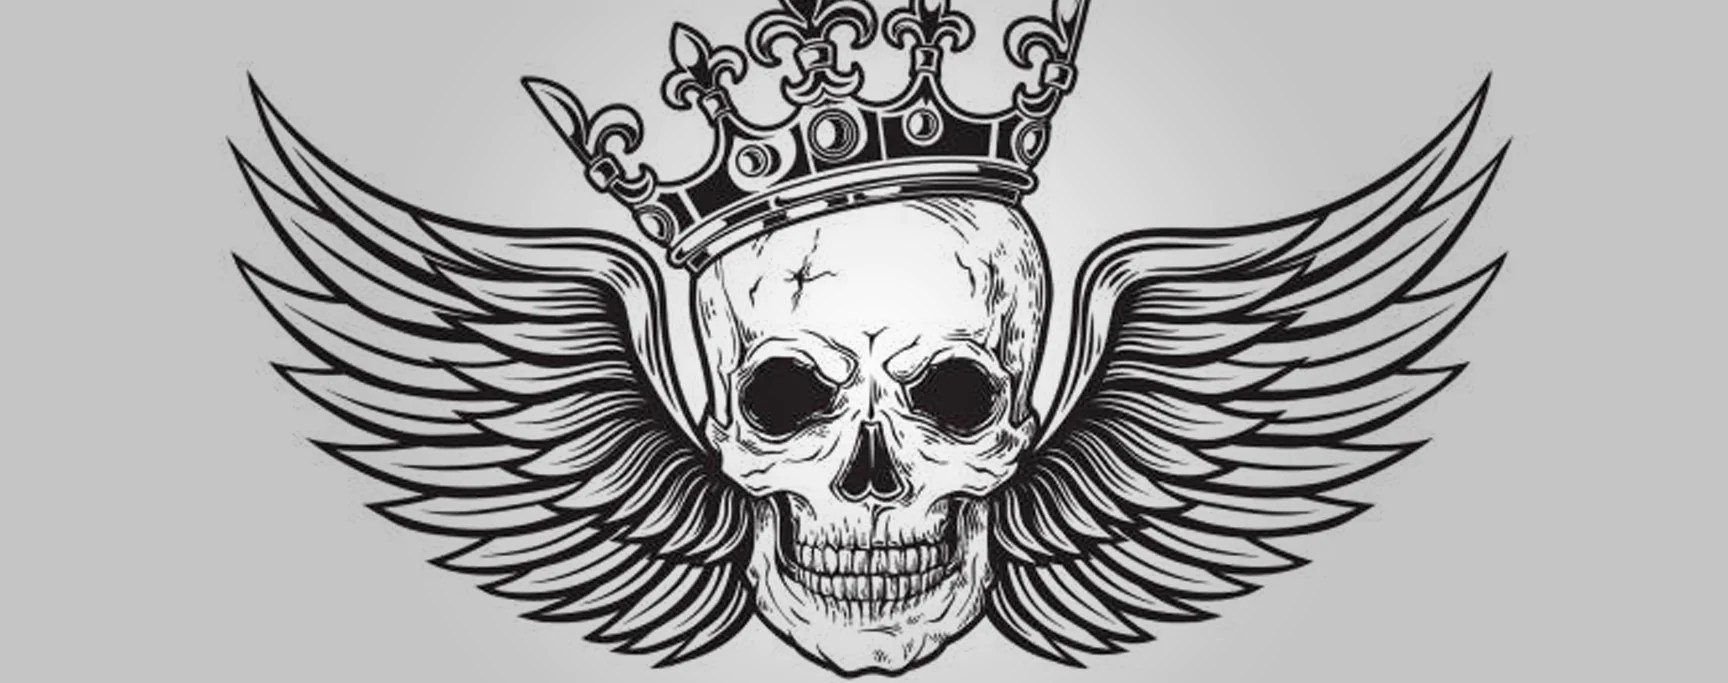 Dessin Tete De Mort / Dessin Tete De Mort Indienne   Top 32 des ...